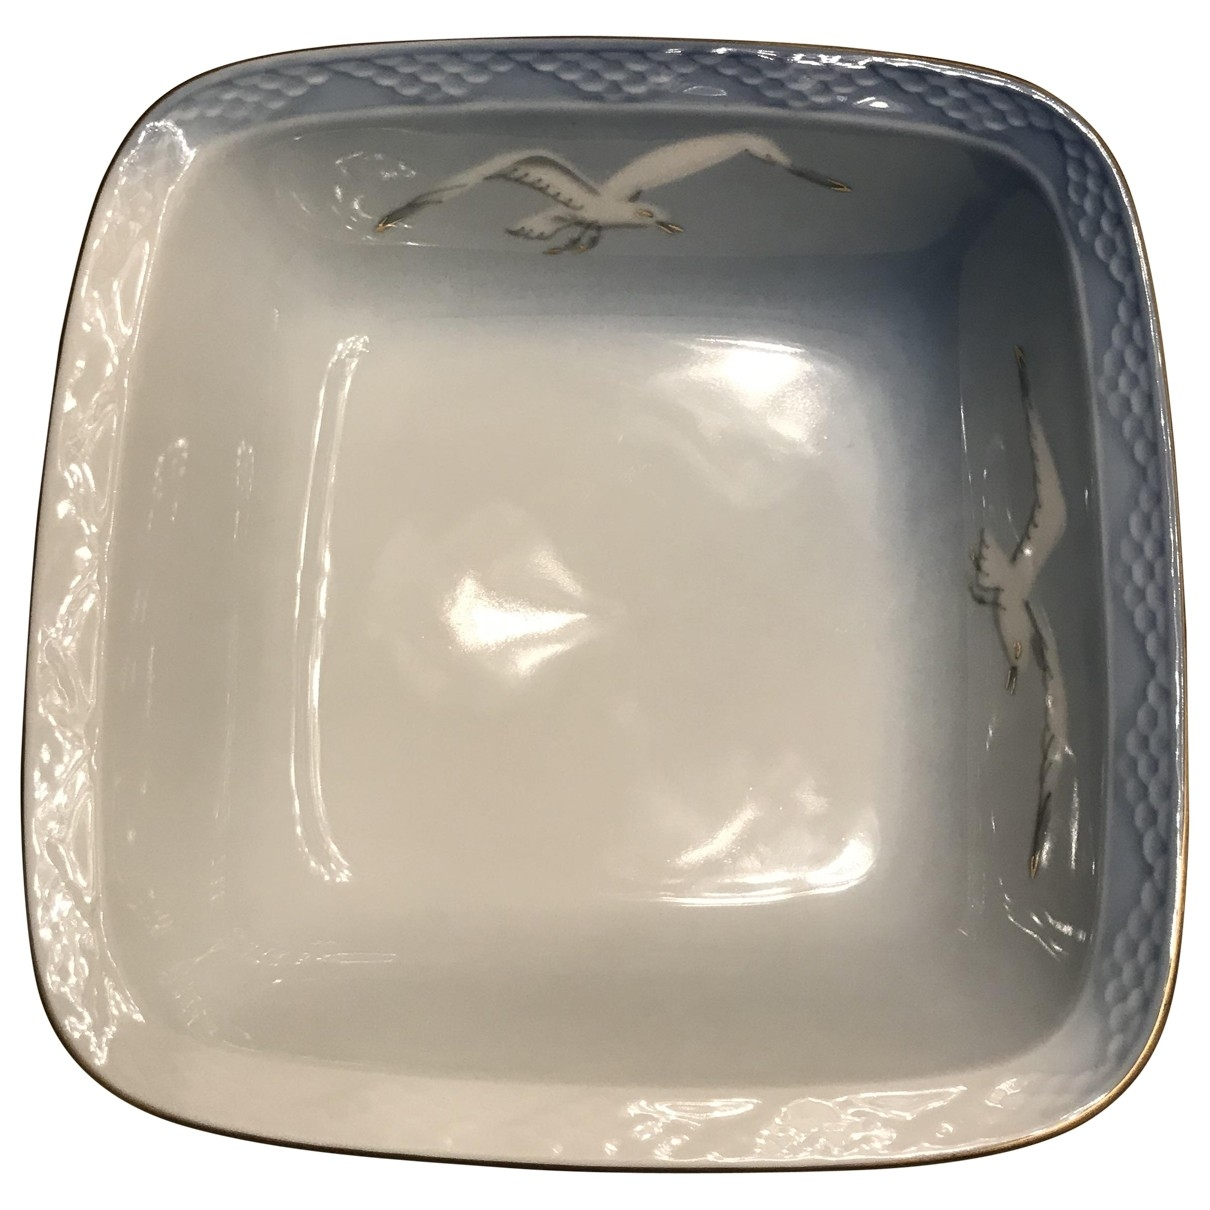 Menaje de mesa de Porcelana Non Signe / Unsigned